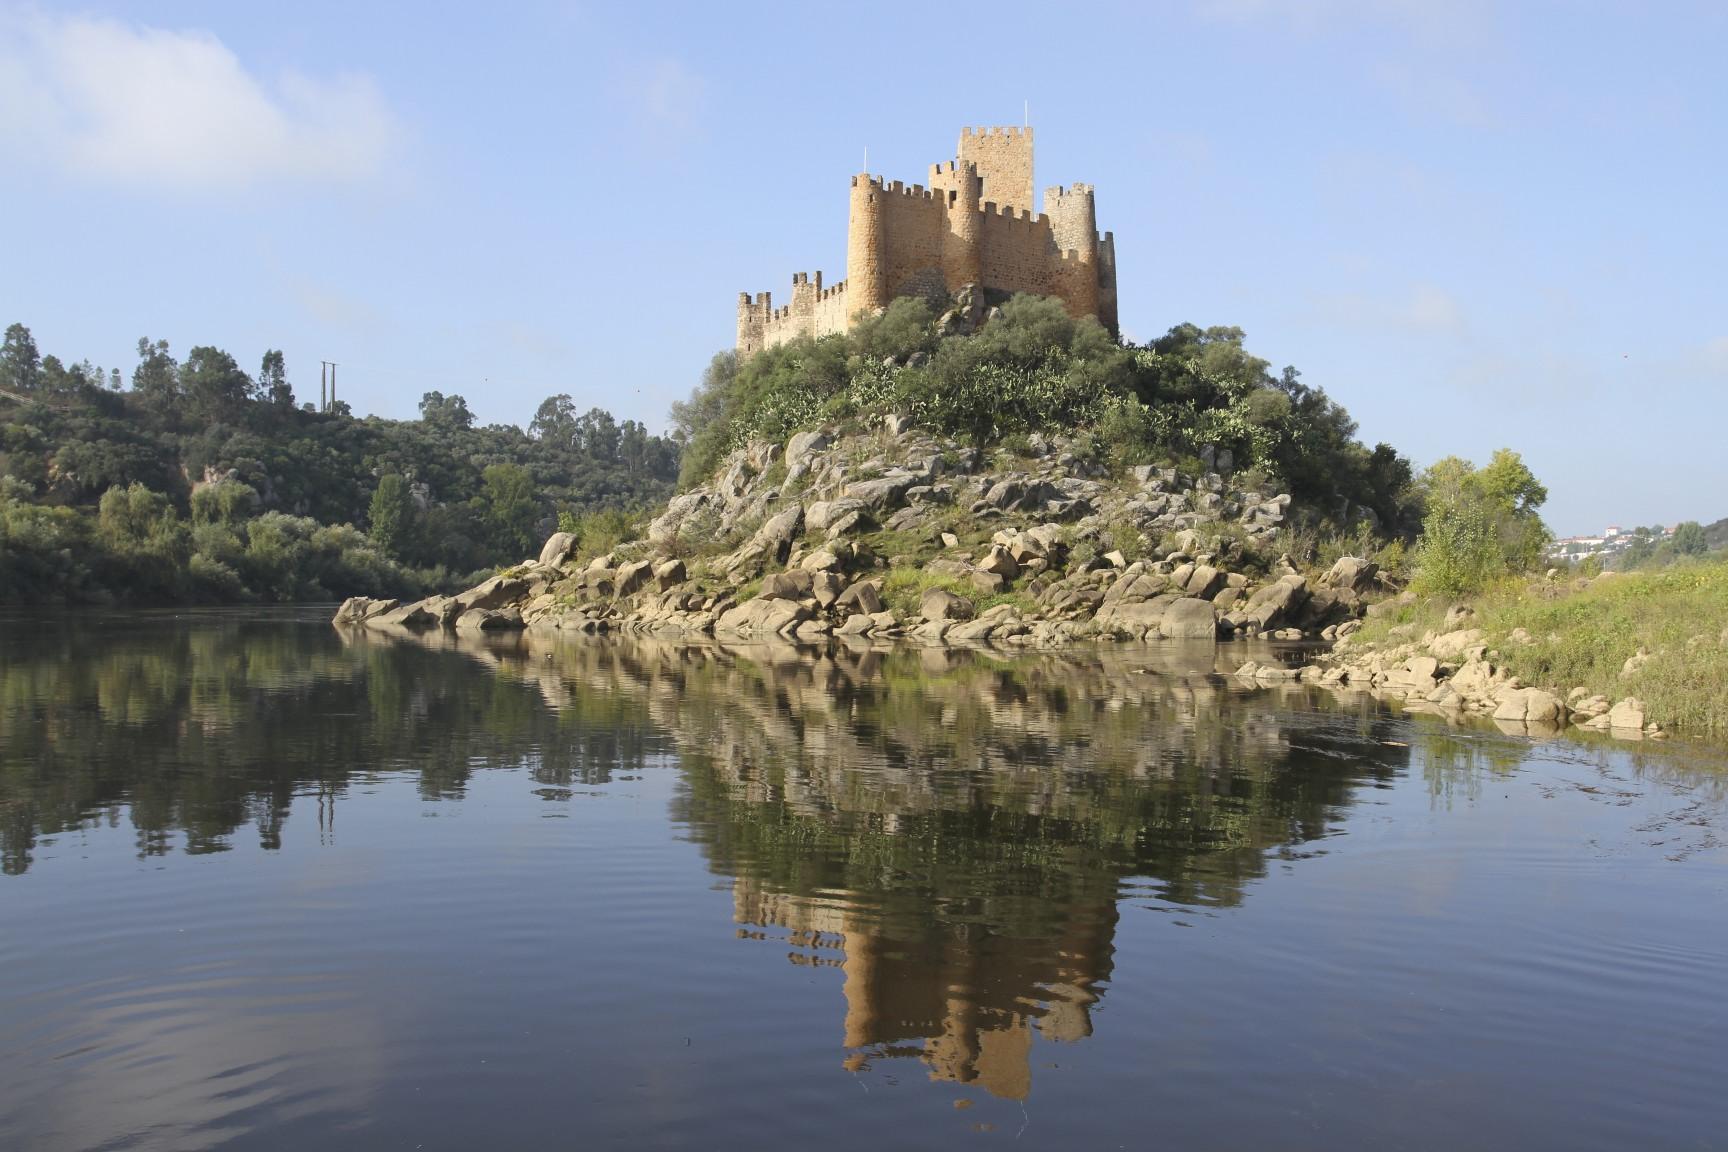 Castelo De Almourol Constancia Portugal Notes From Camelid Country